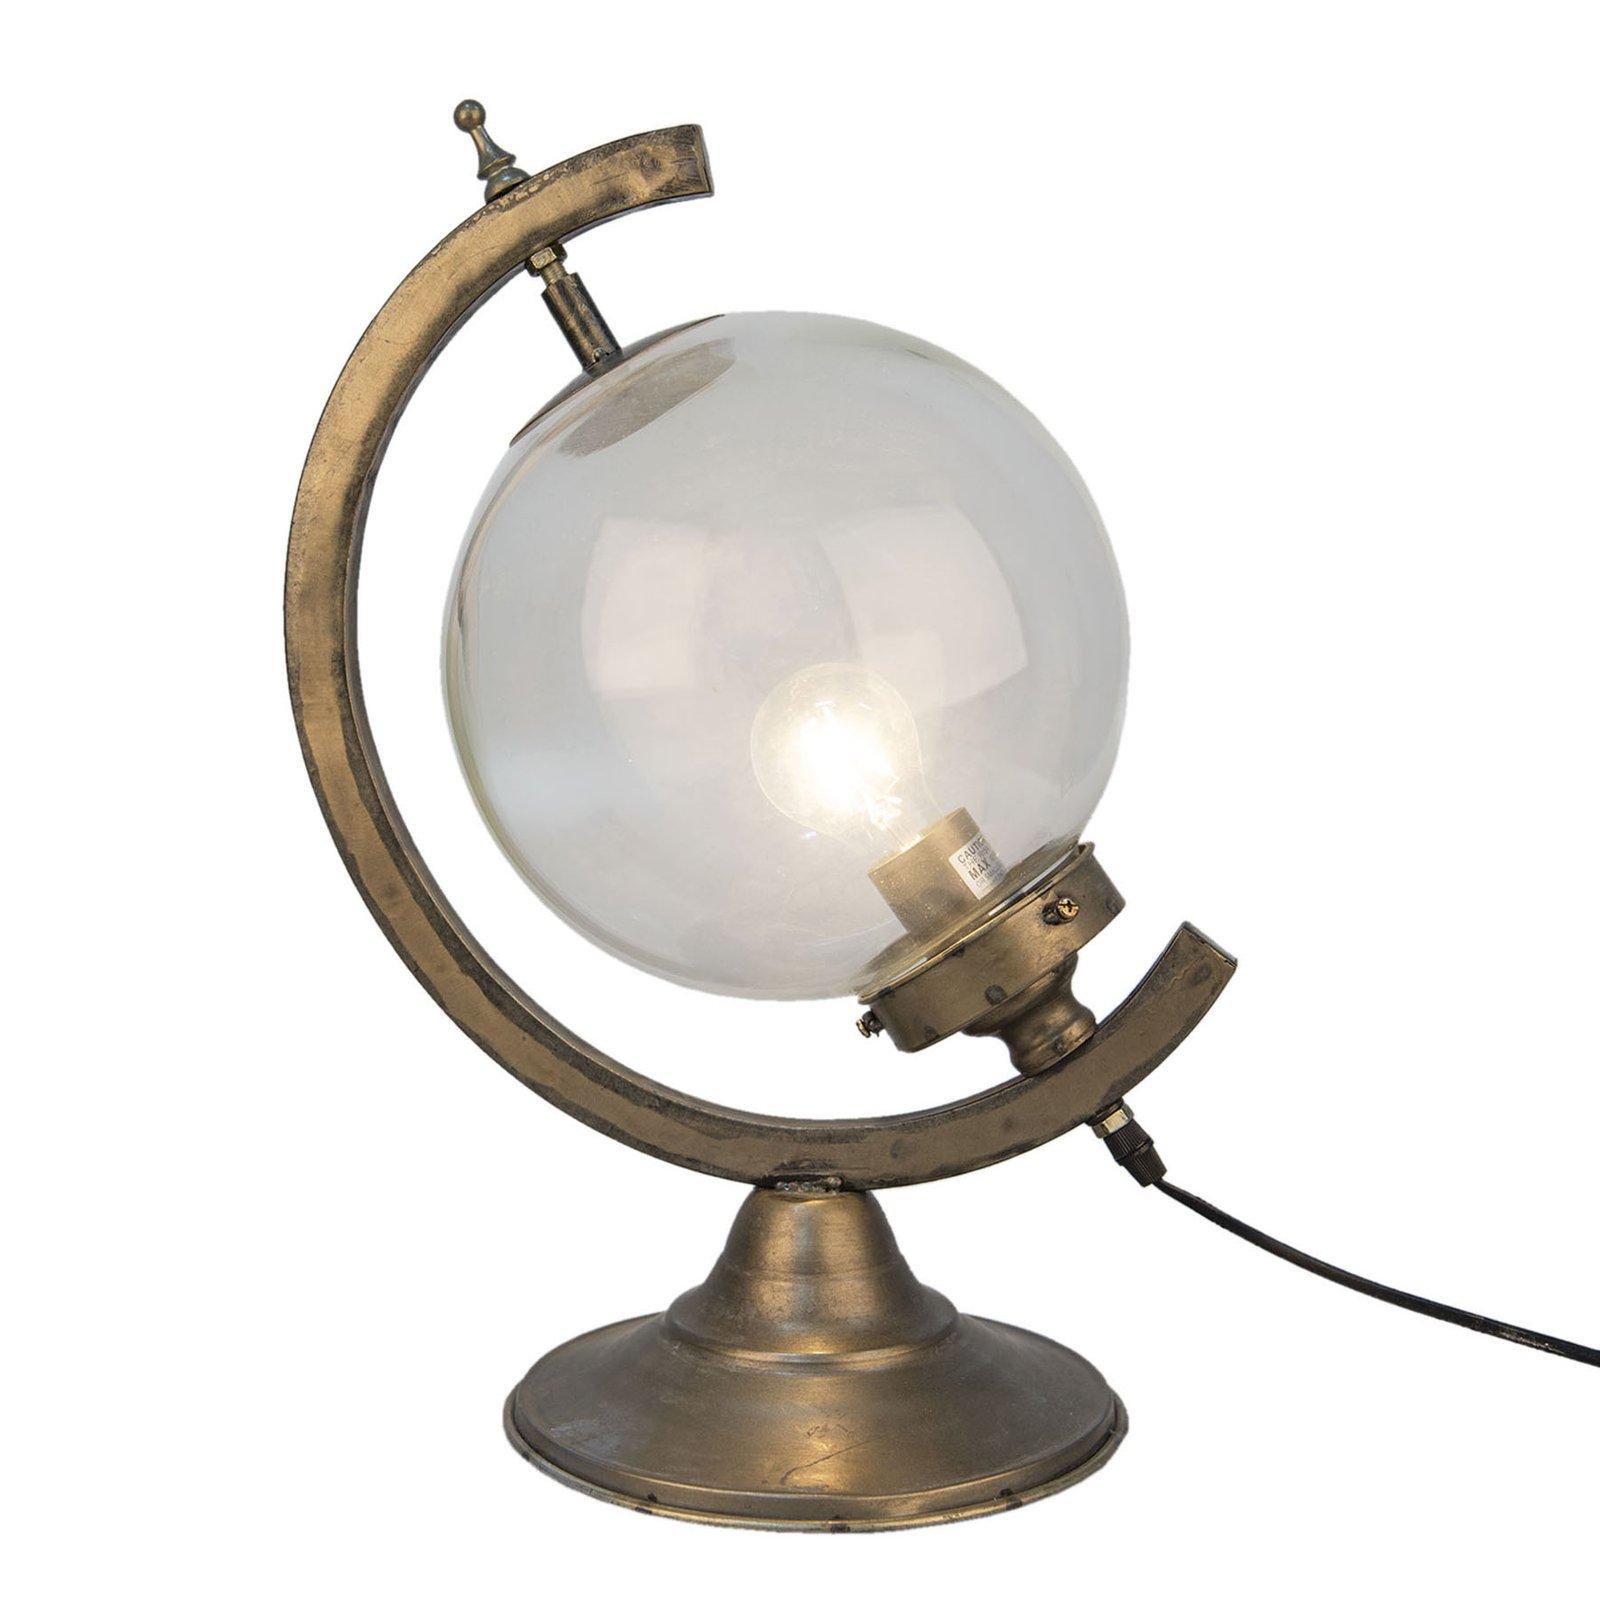 560 bordlampe, antikk globus-form